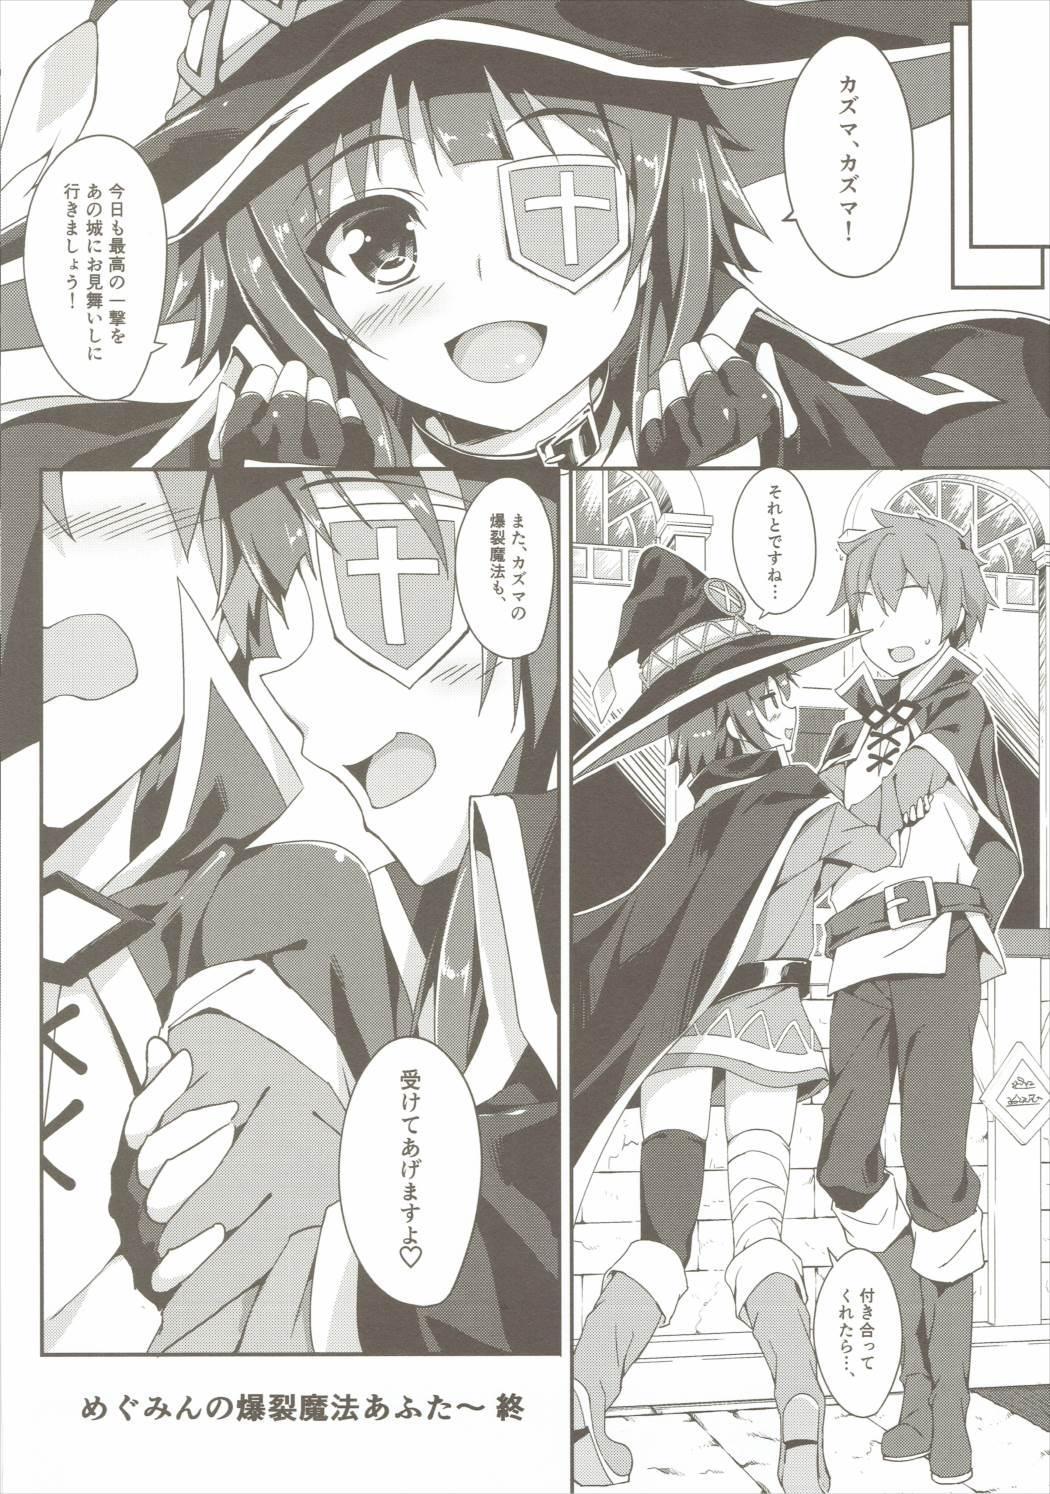 Megumin no Bakuretsu Mahou After 18